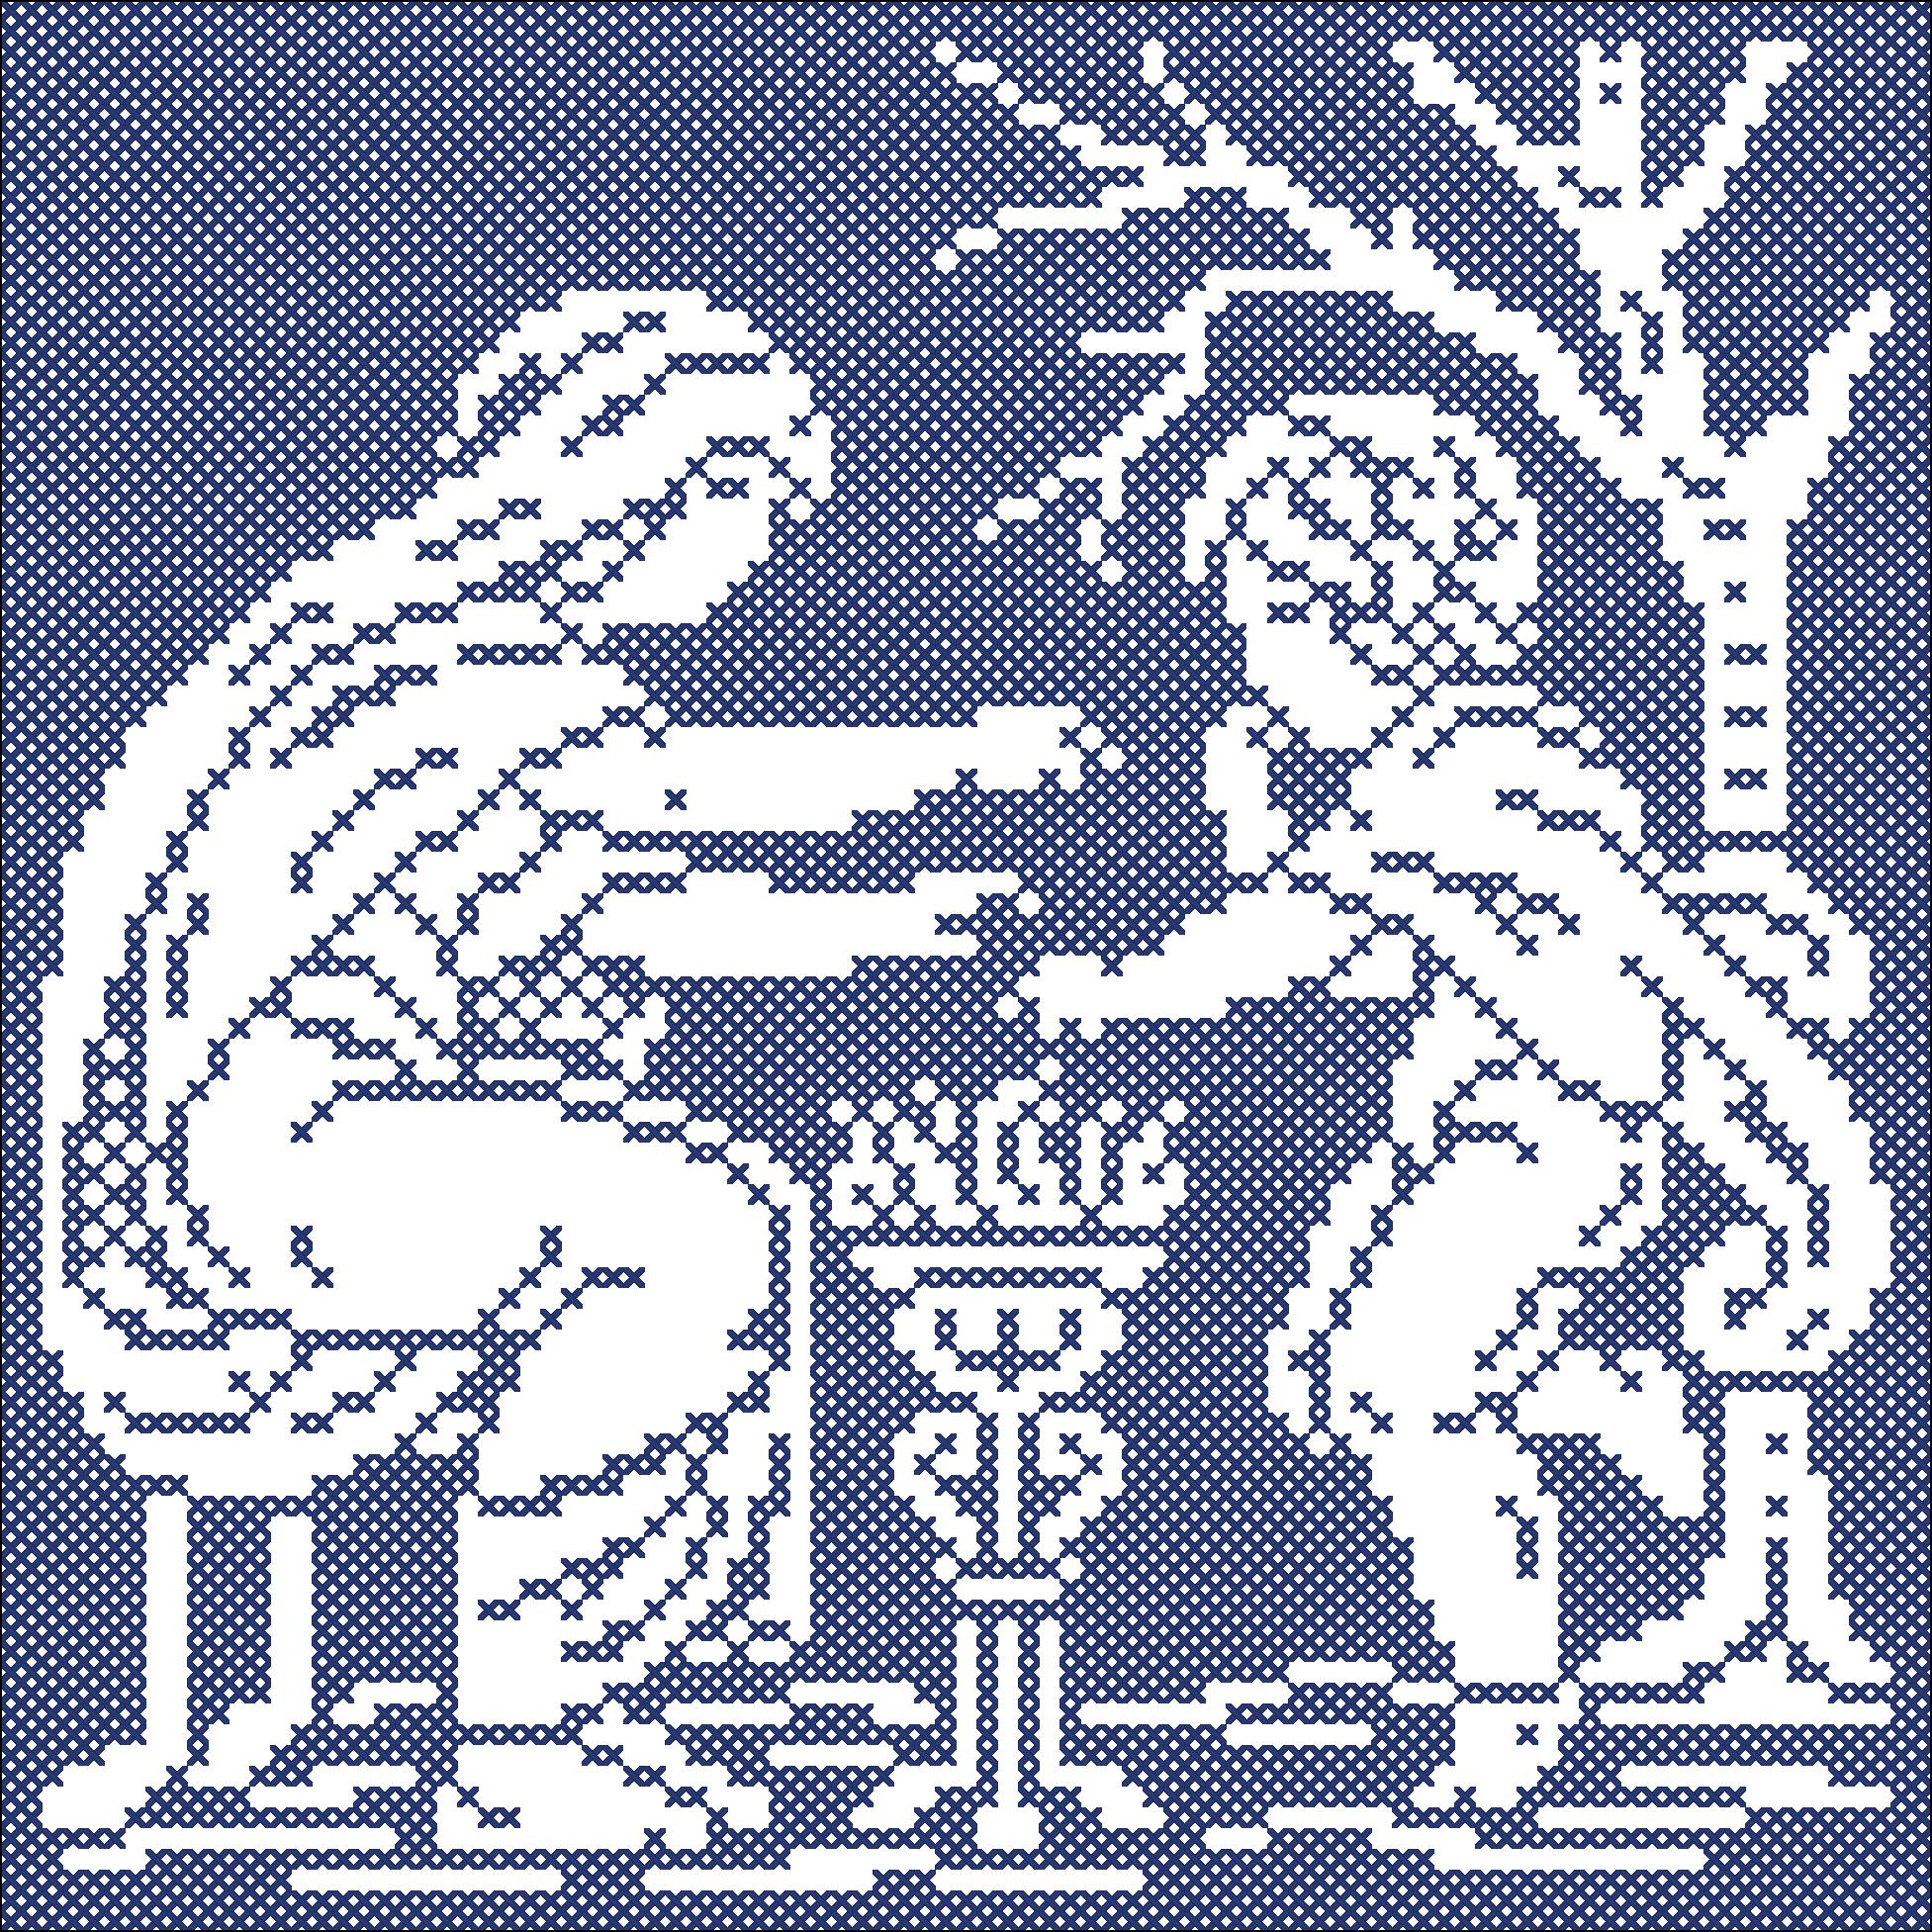 invierno-azul.png (Image PNG, 1953×1953 pixels) - Redimensionnée (37%)